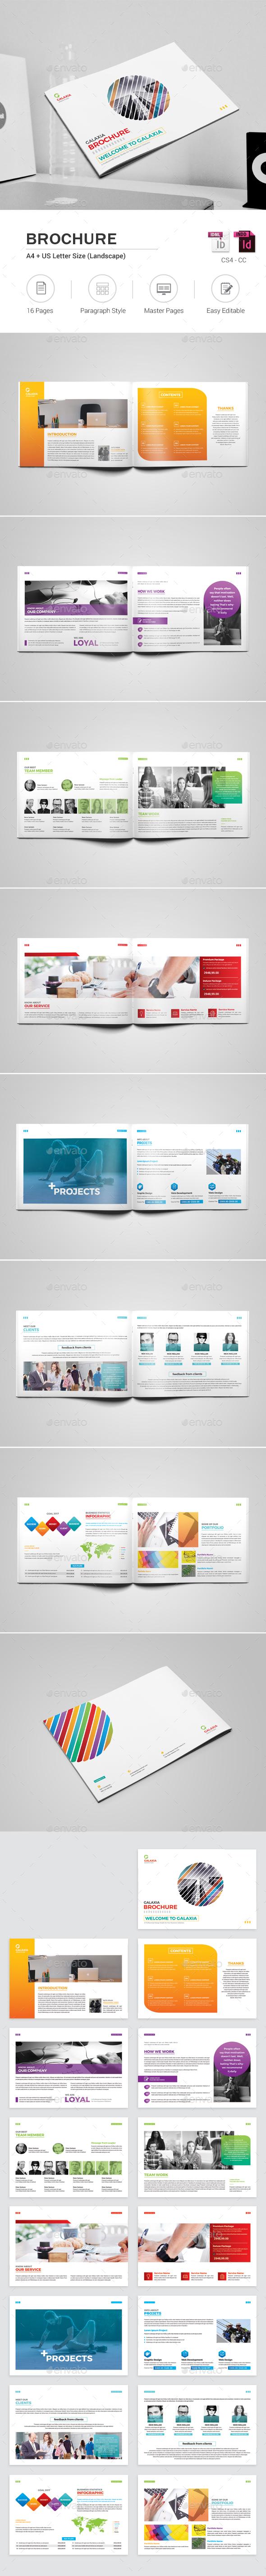 Colorful Brochure - Corporate Brochures